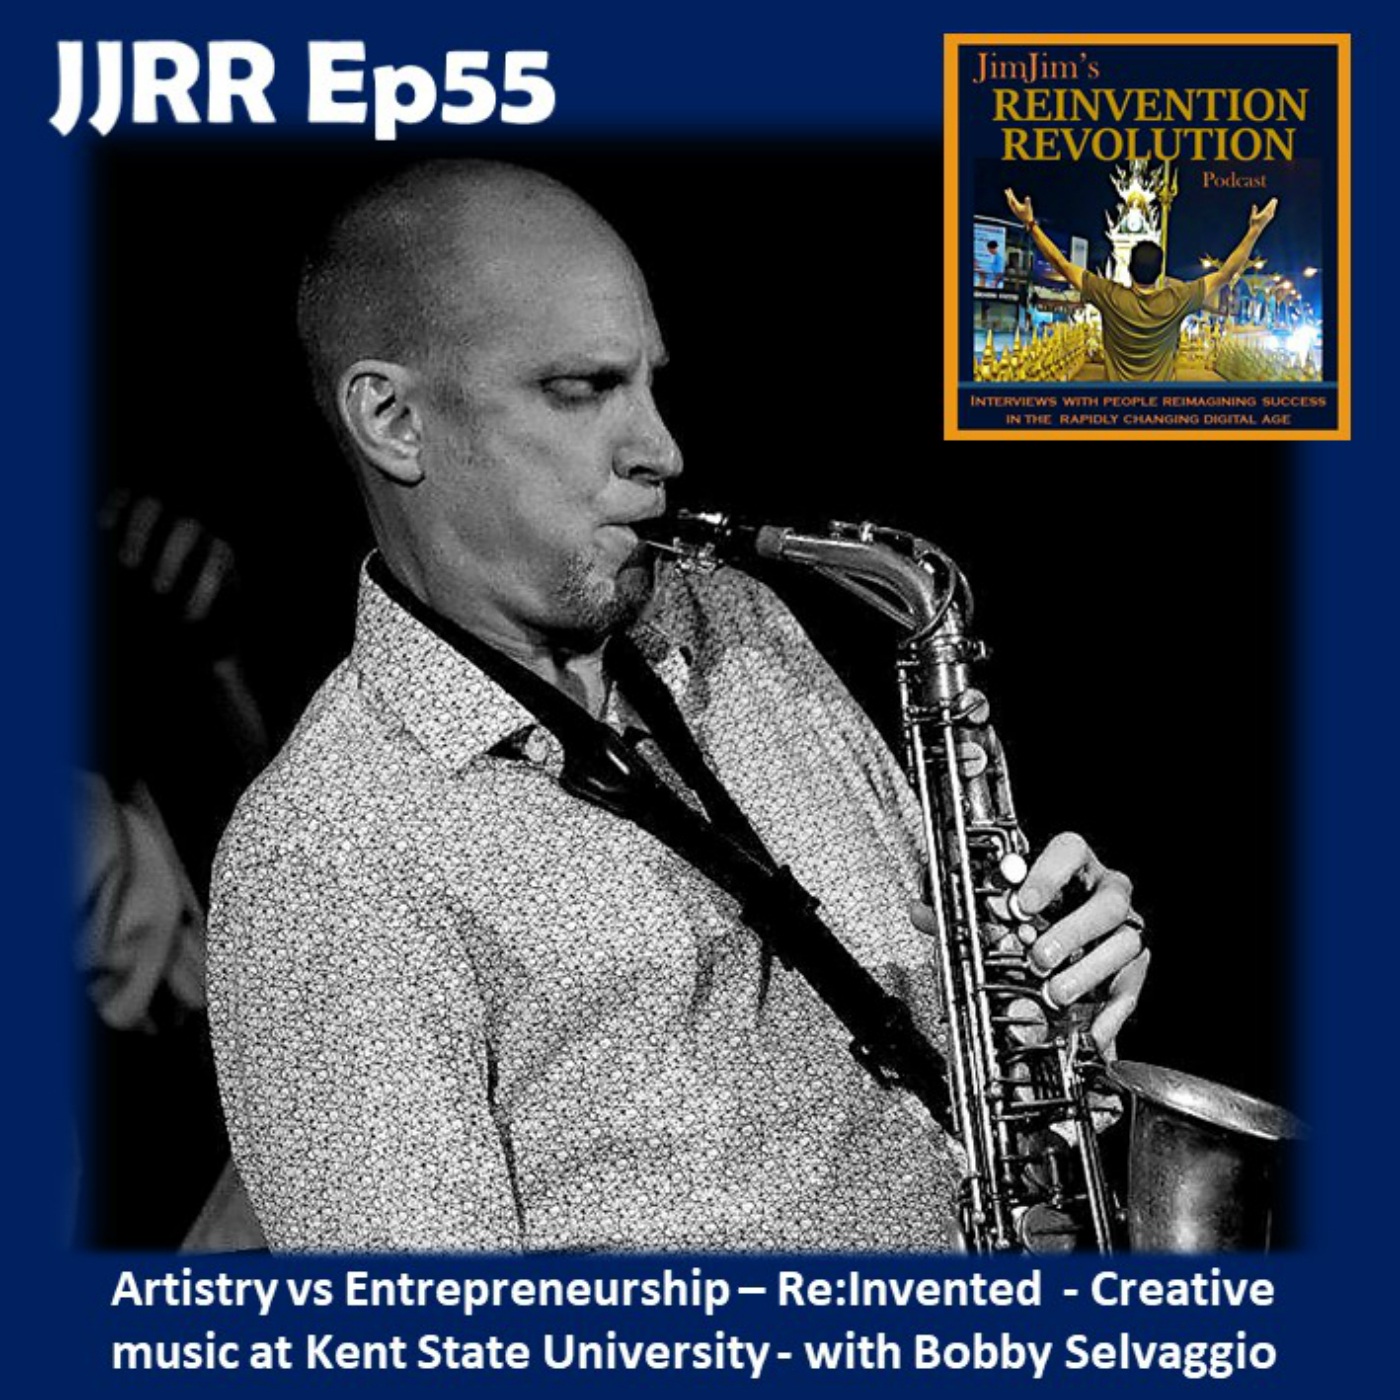 JJRR 55 Artistry vs Entrepreneurship – Re:Invented – Creative music at Kent State University – Bobby Selvaggio